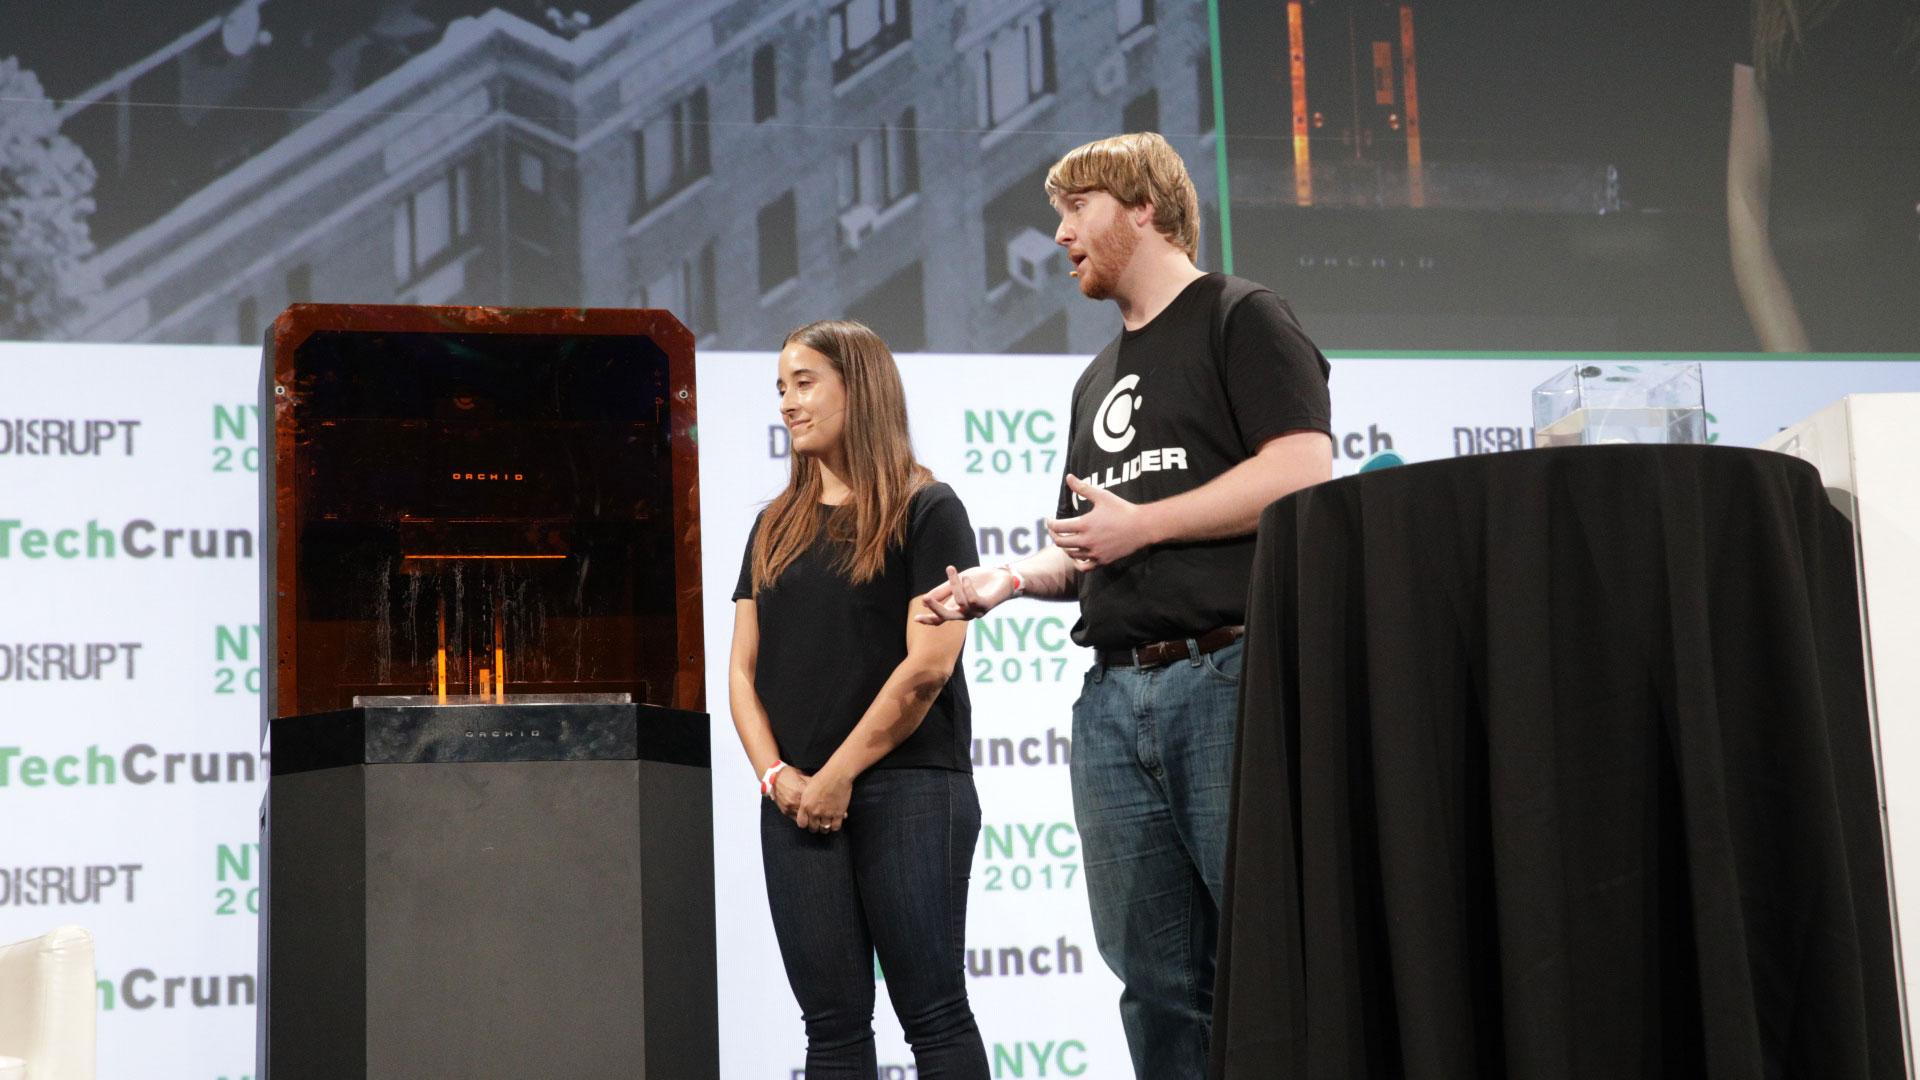 Disrupt NY 2017 Startup Battlefield Finals: Collider